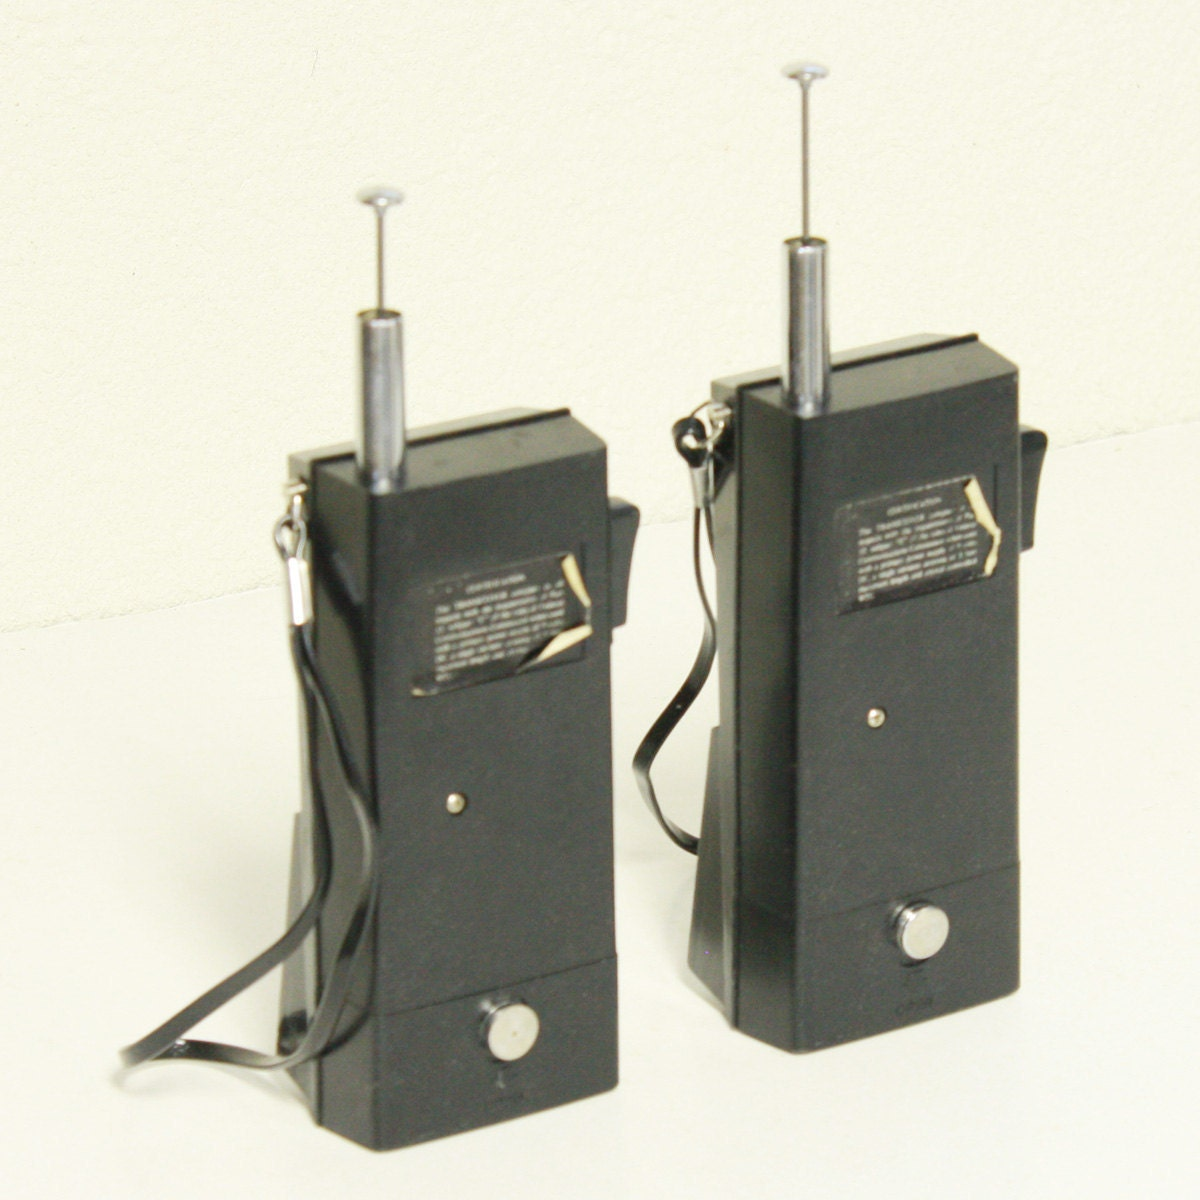 Vintage Walkie Talkies Ranger Solid State Transceiver